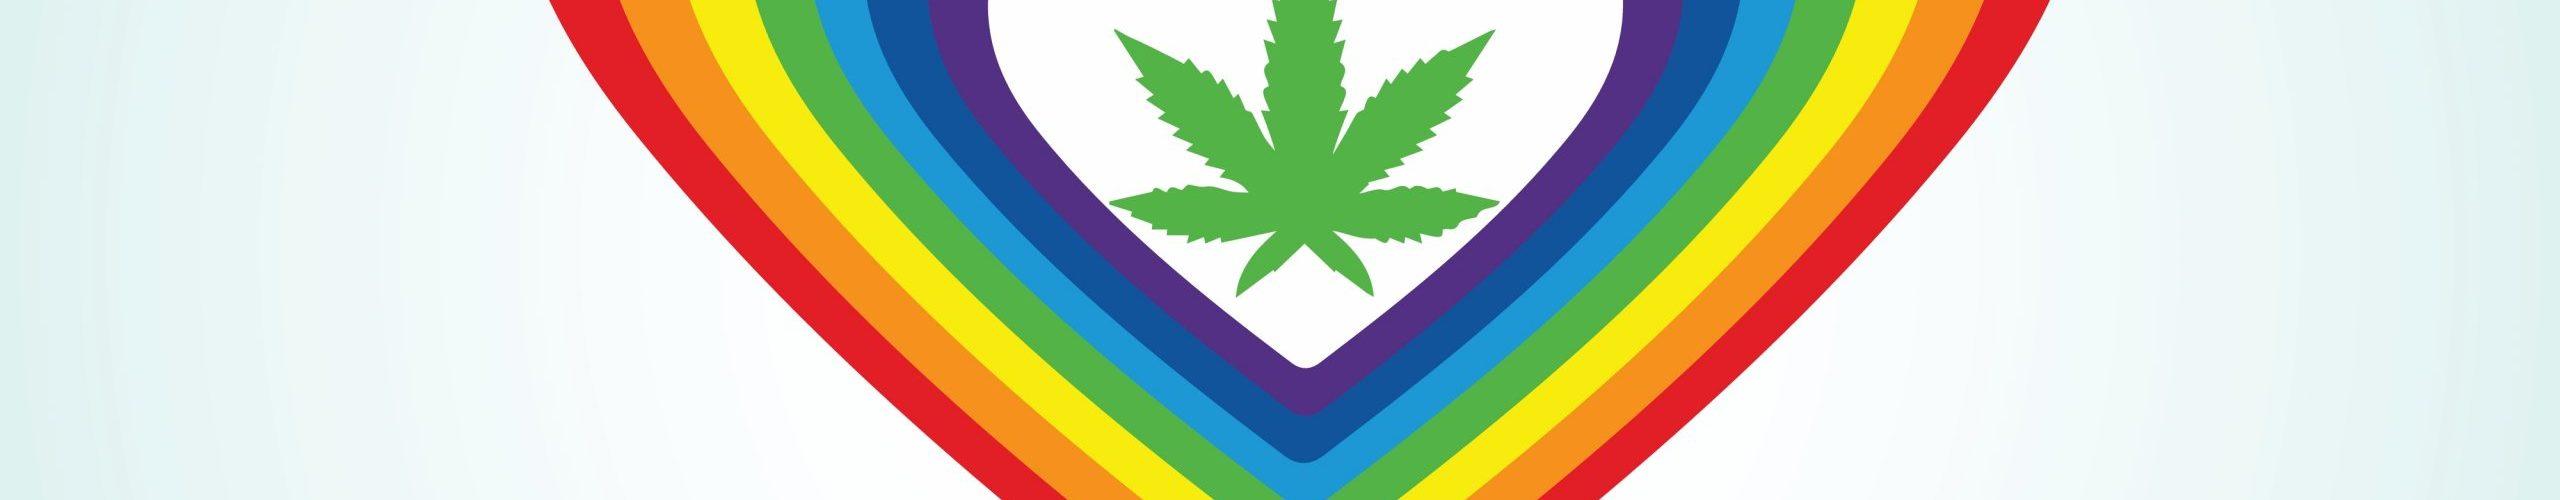 cannabis and gay pride